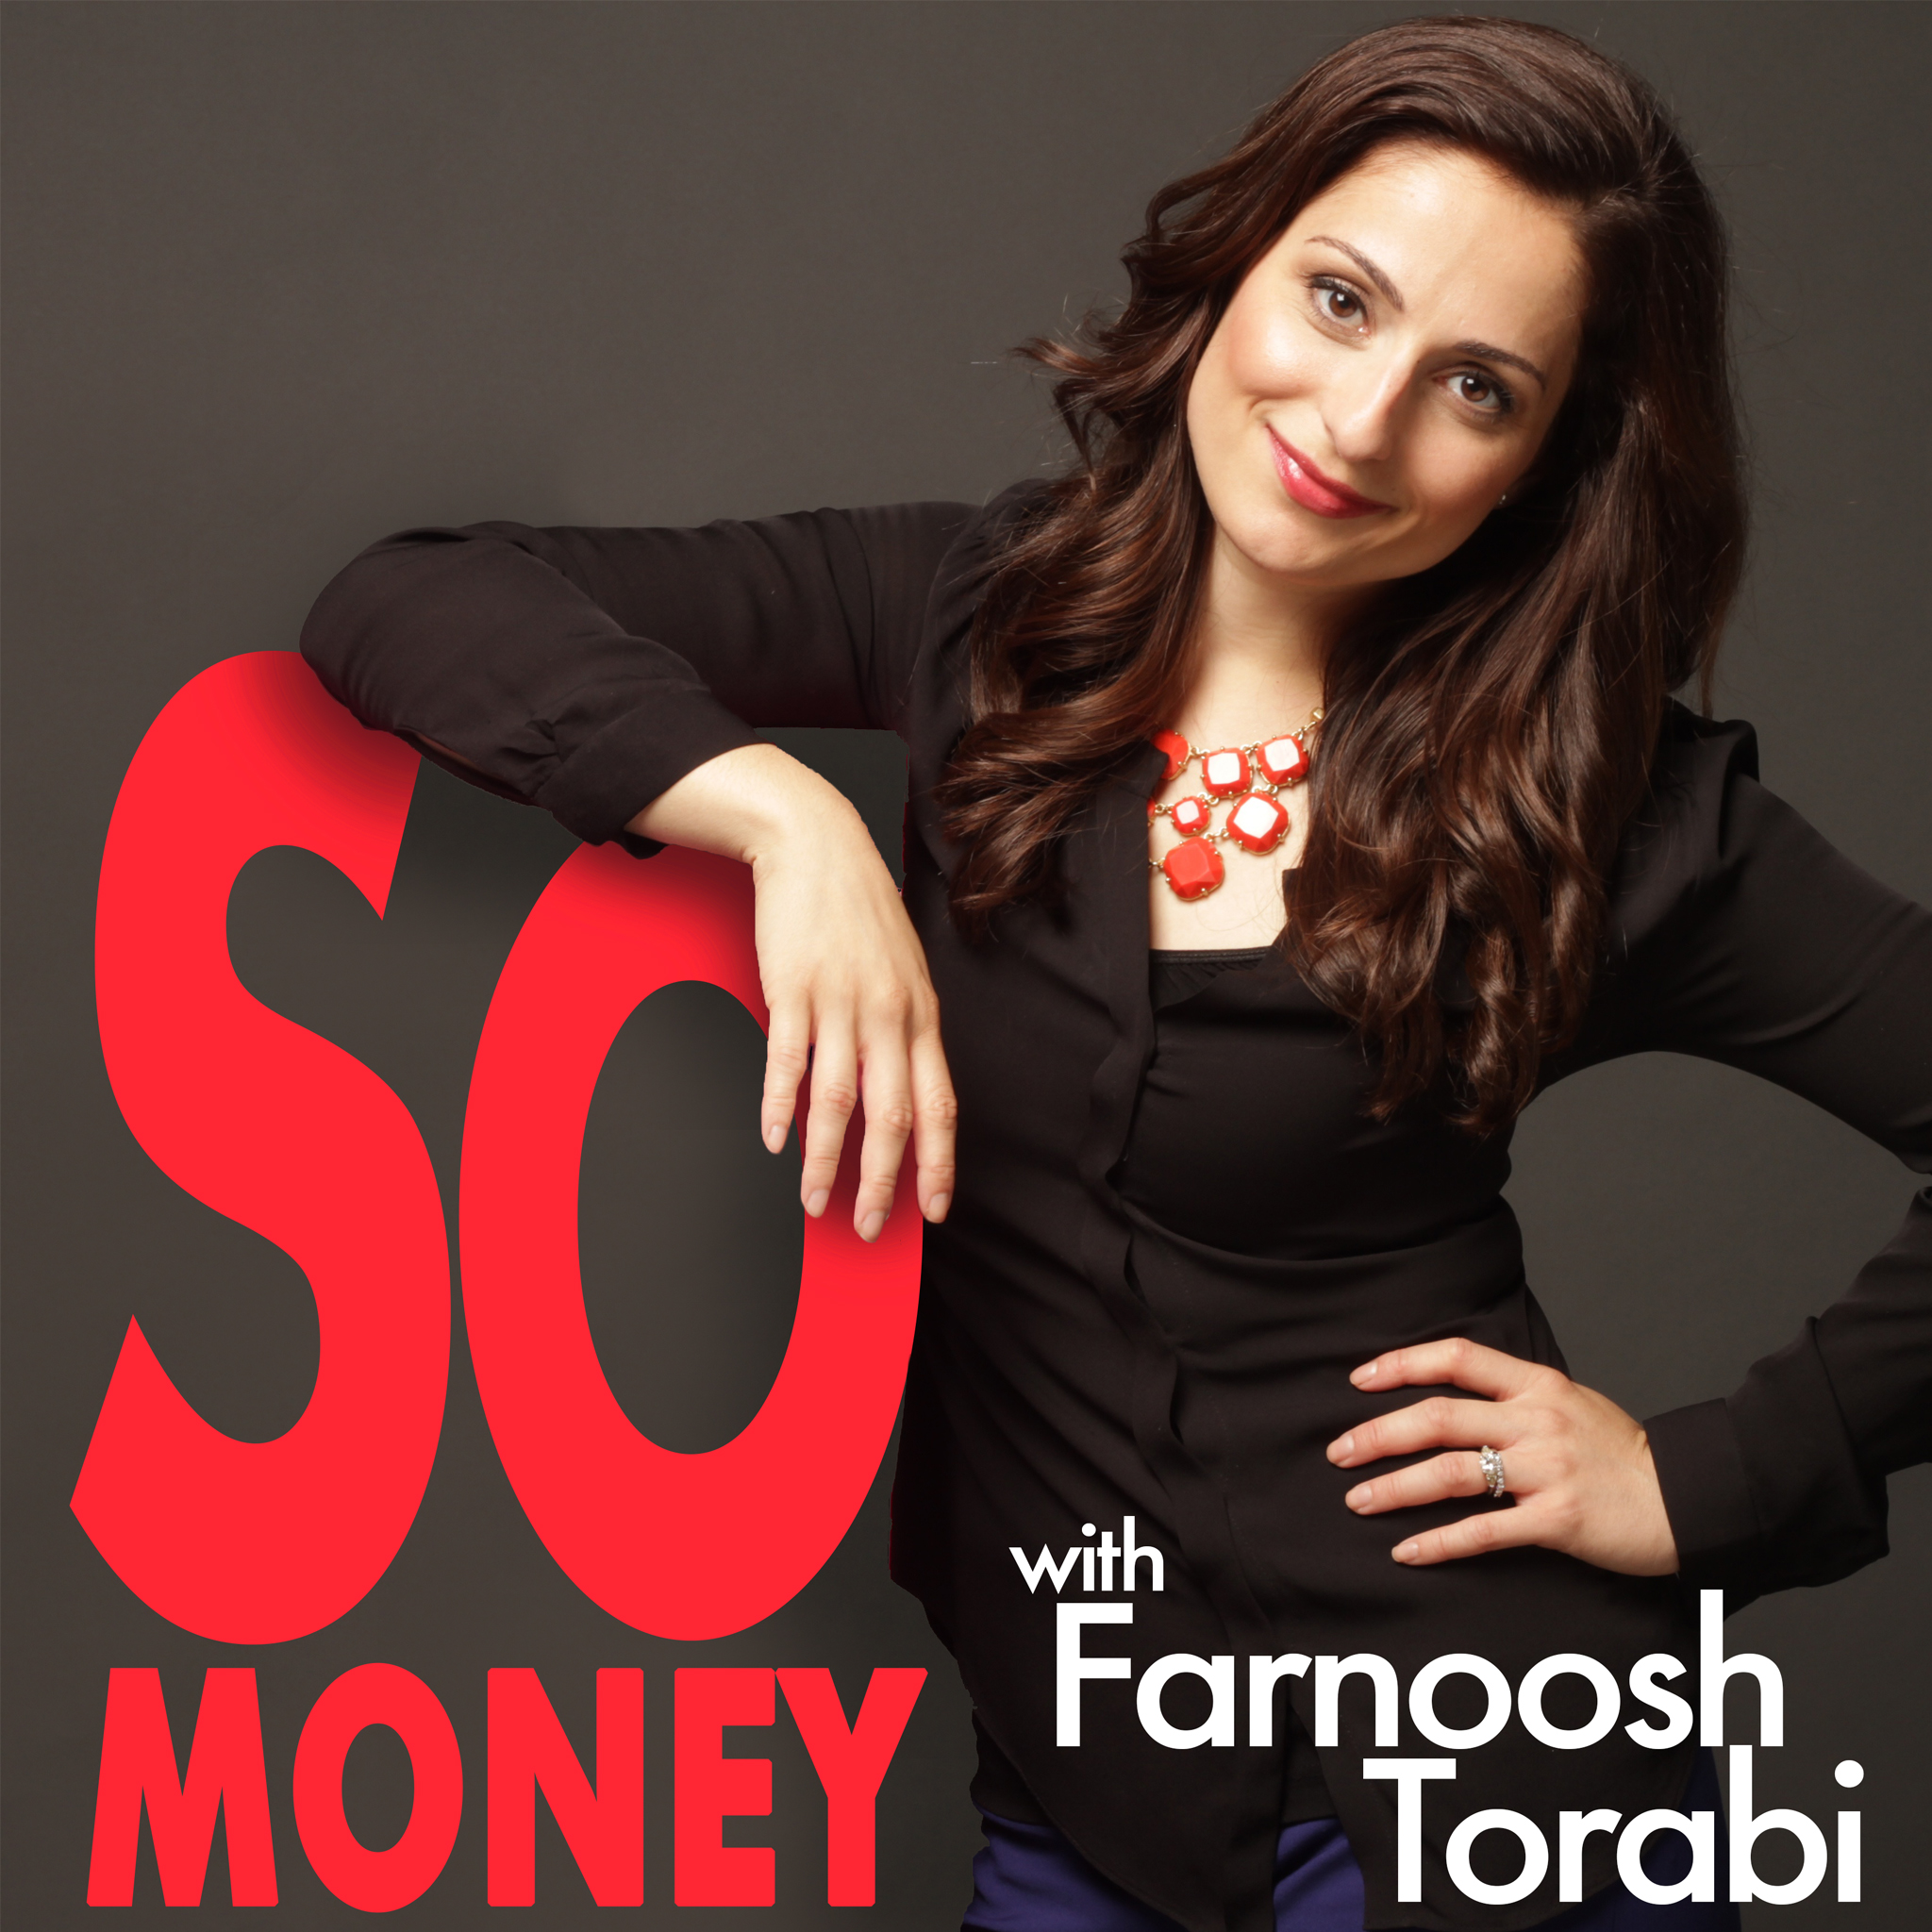 So Money by Farnoosh Torabi podcast logo